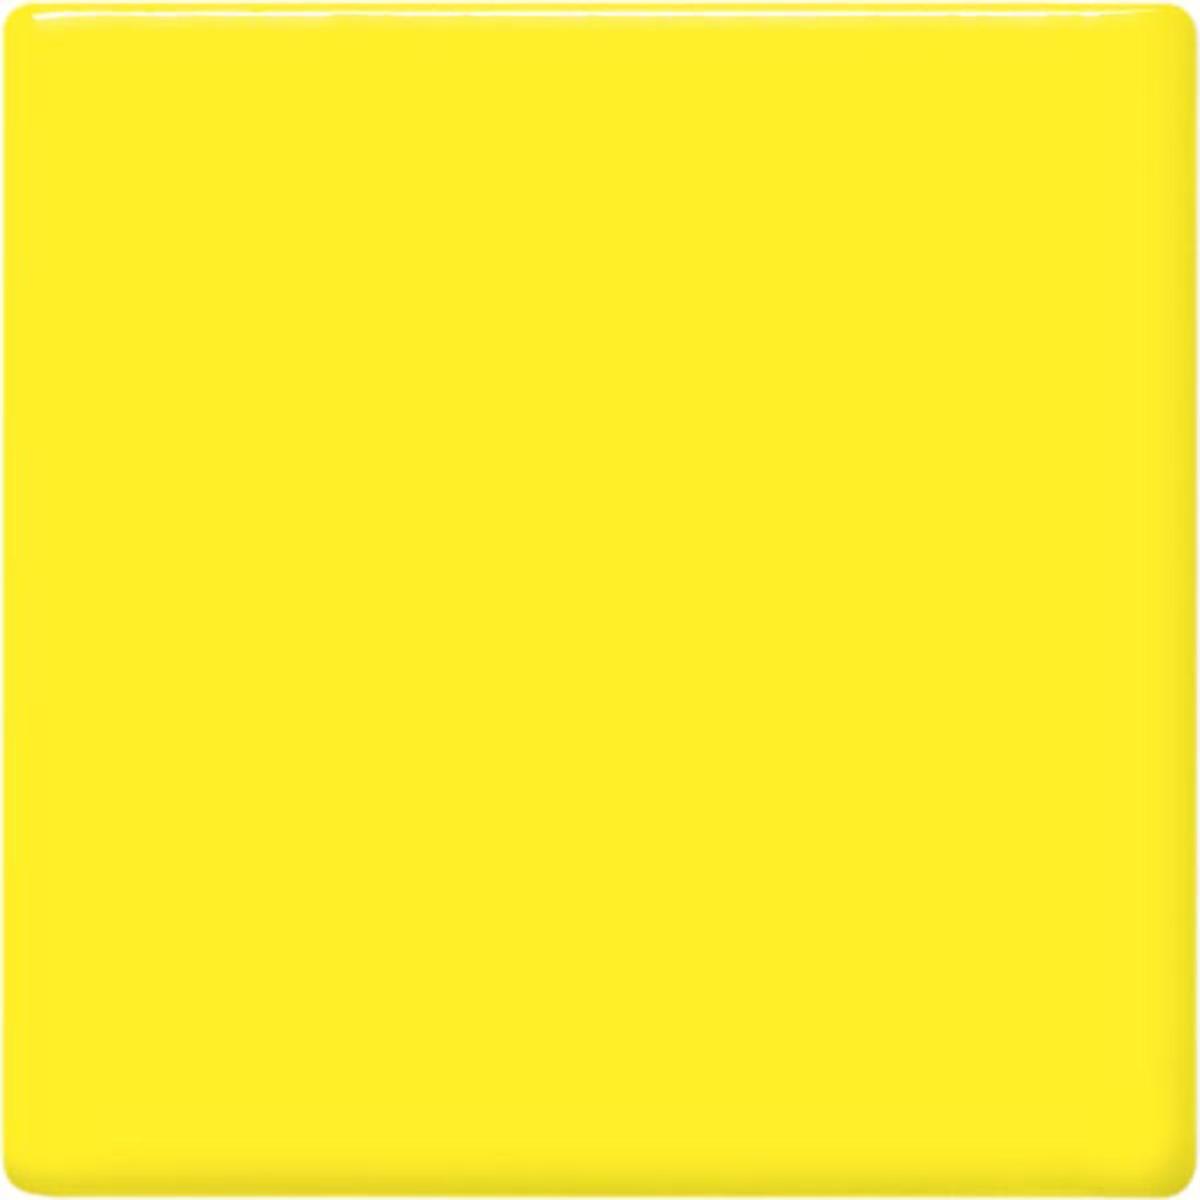 venta de esmalte para cerámica amaco teachers palette Tp-60 lemon baja temperatura